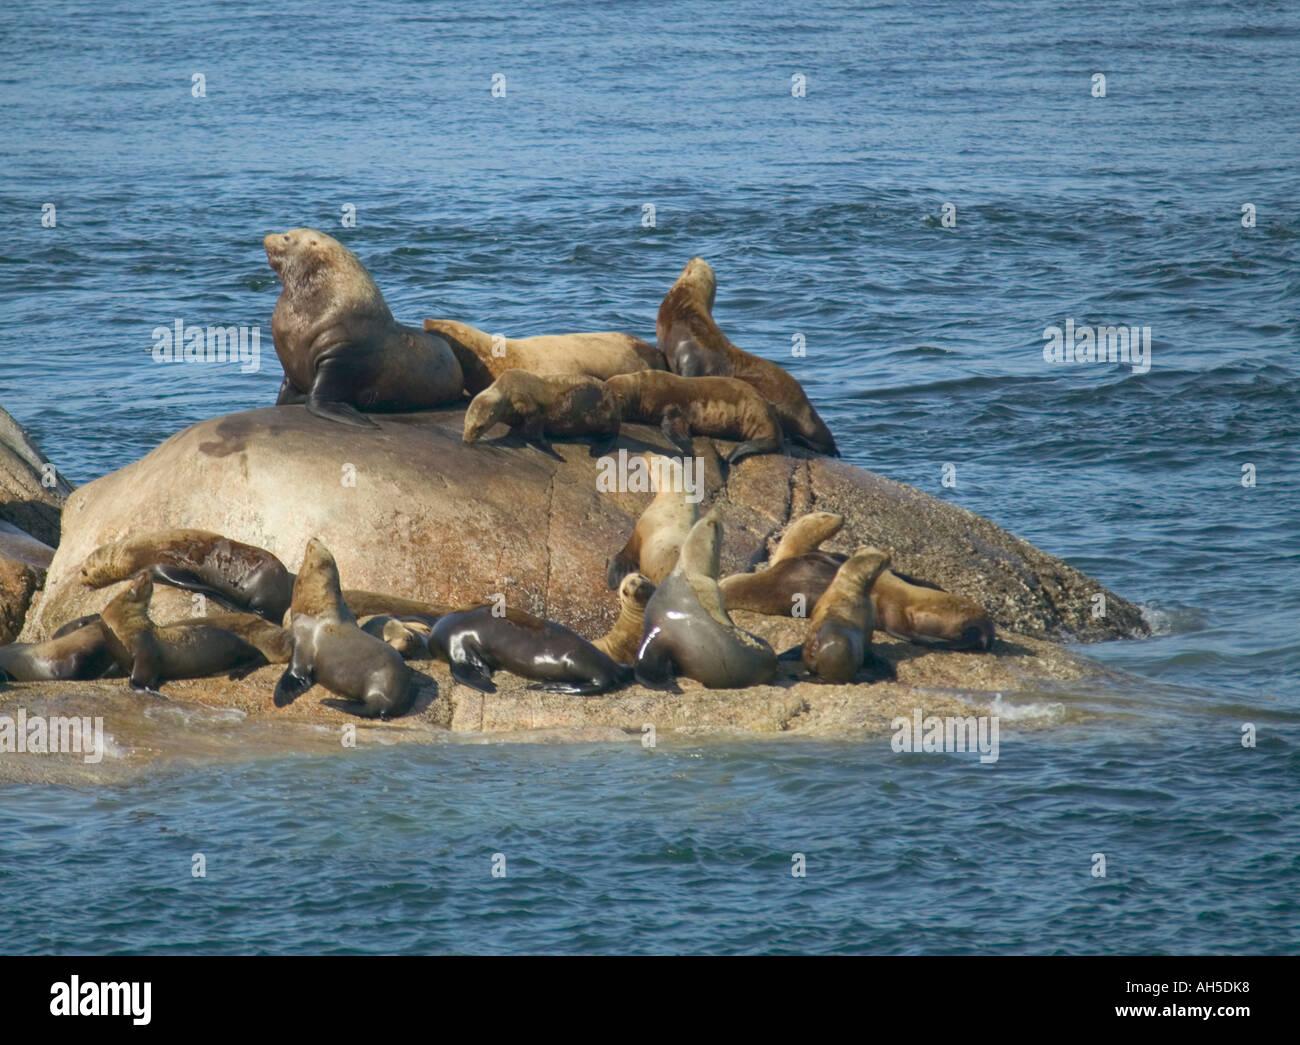 Stellers Sea Lions Eumetopias jubatus on rocks in Glacier Bay National Park Alaska USA - Stock Image